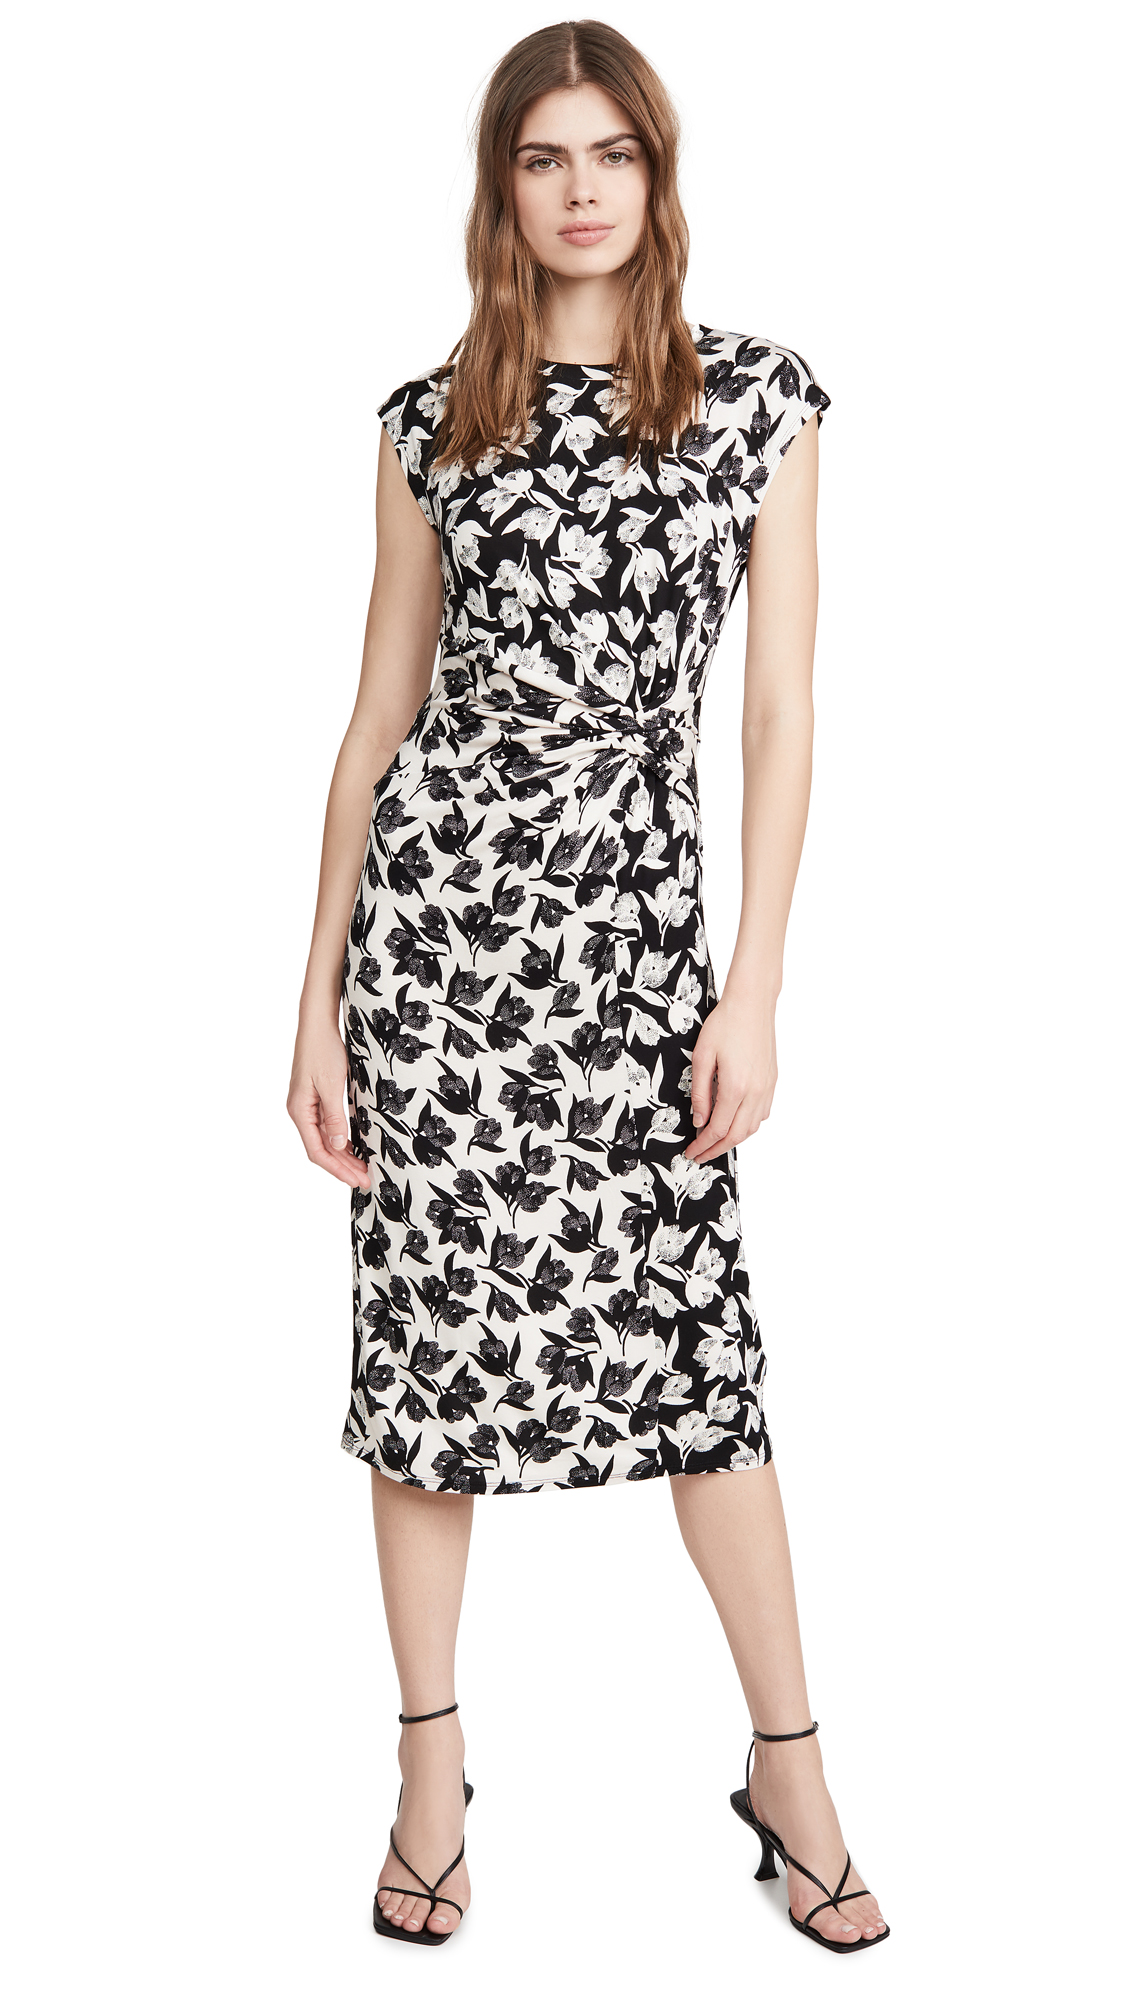 Joie Zuzanna Dress - 40% Off Sale